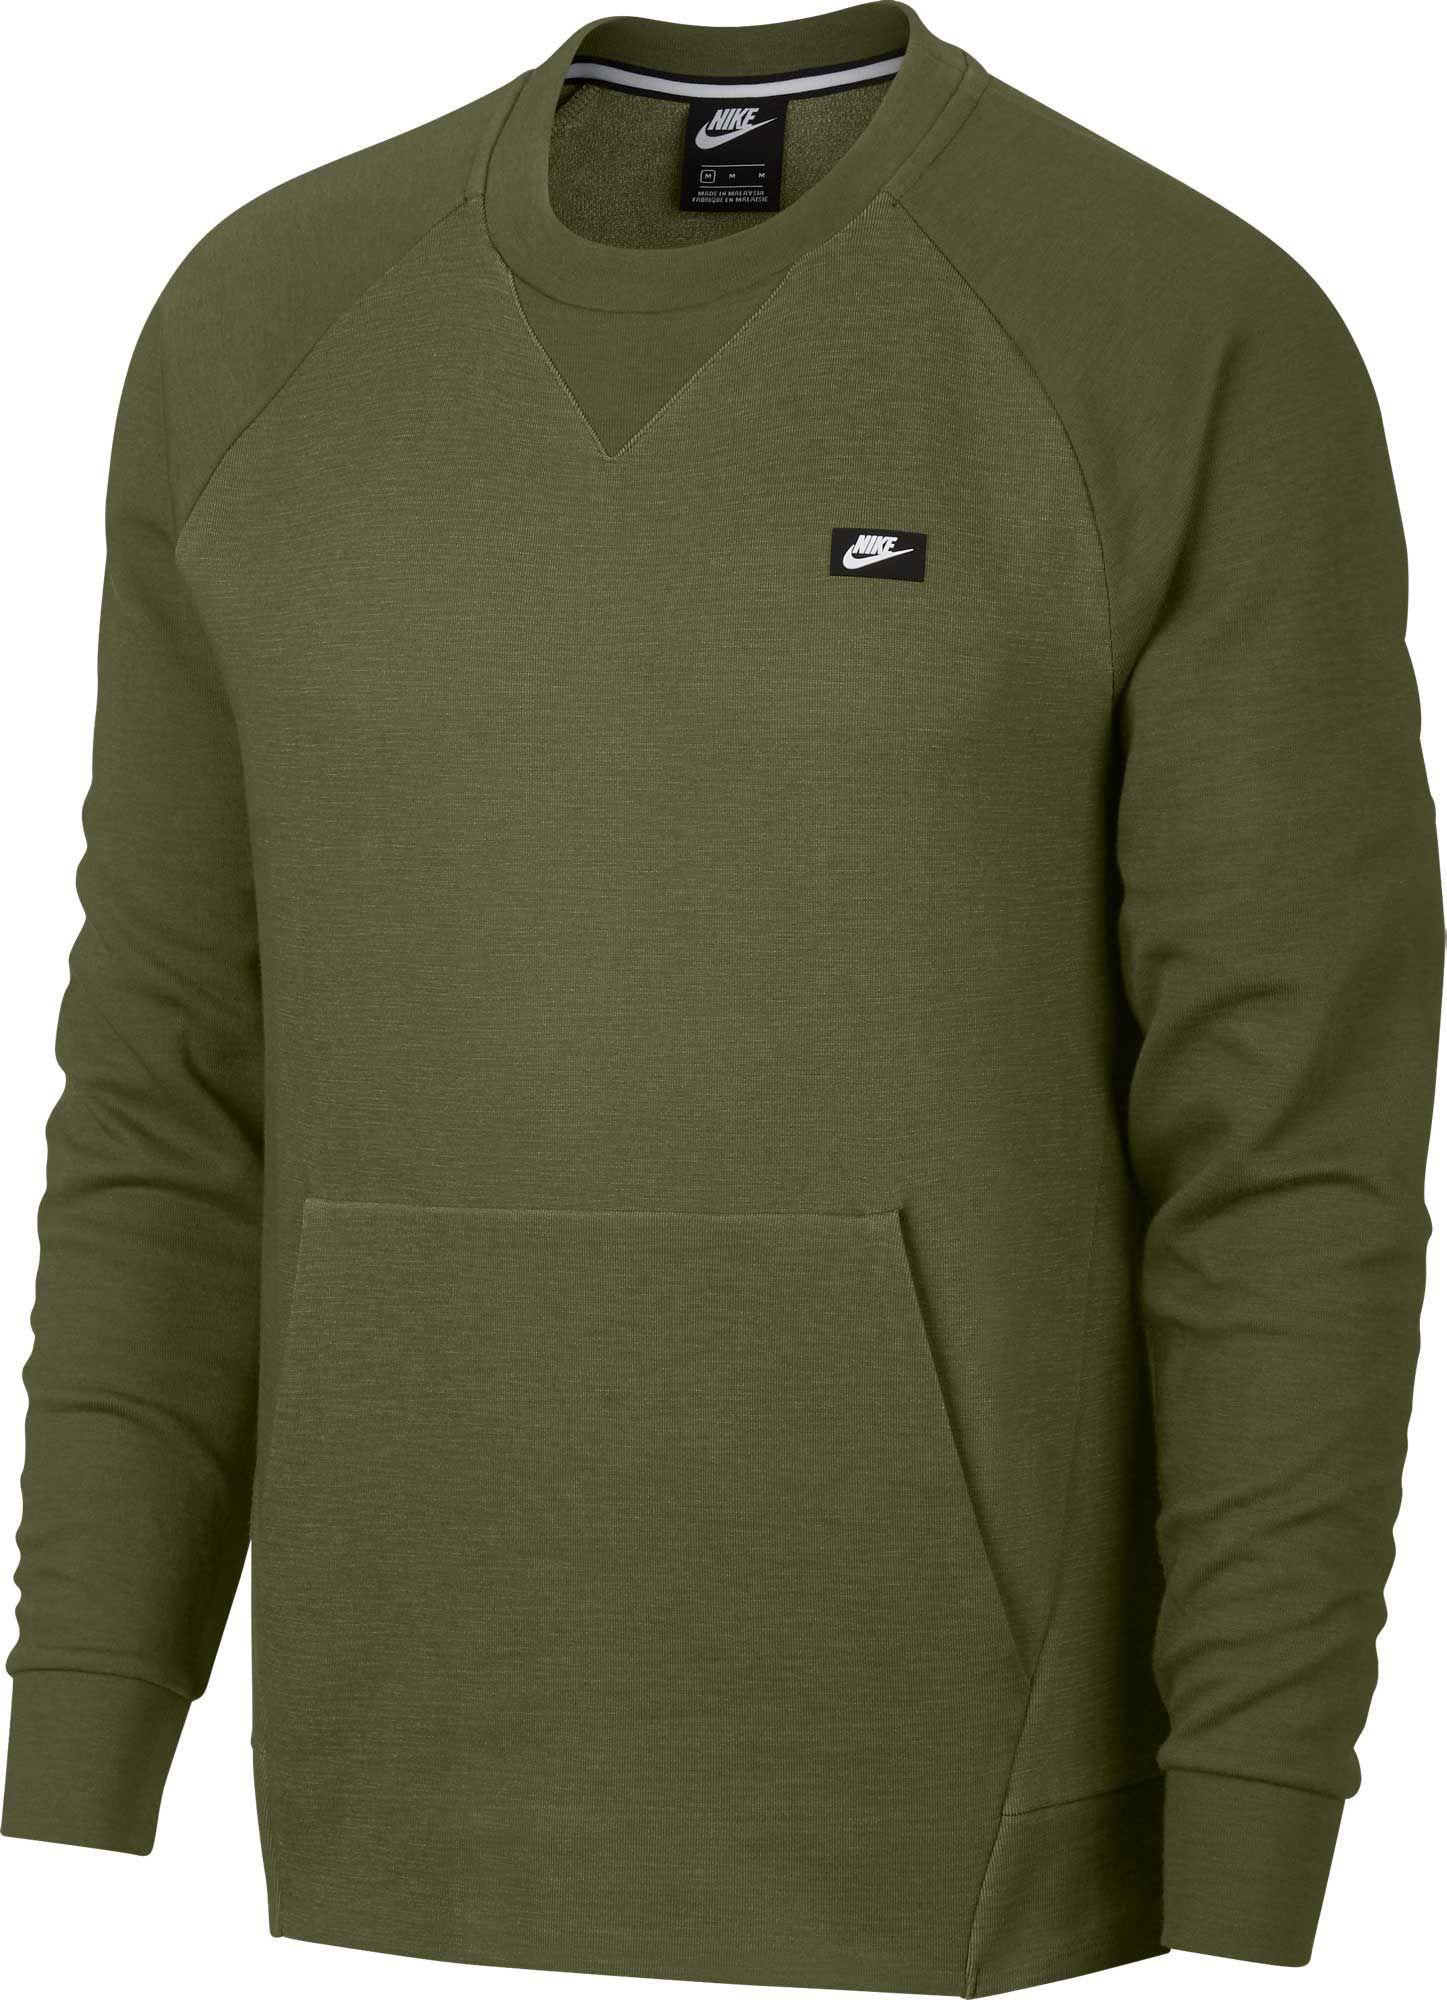 Nike Sportswear, Nike Optic Fleece Sweatshirt, grau | mirapodo